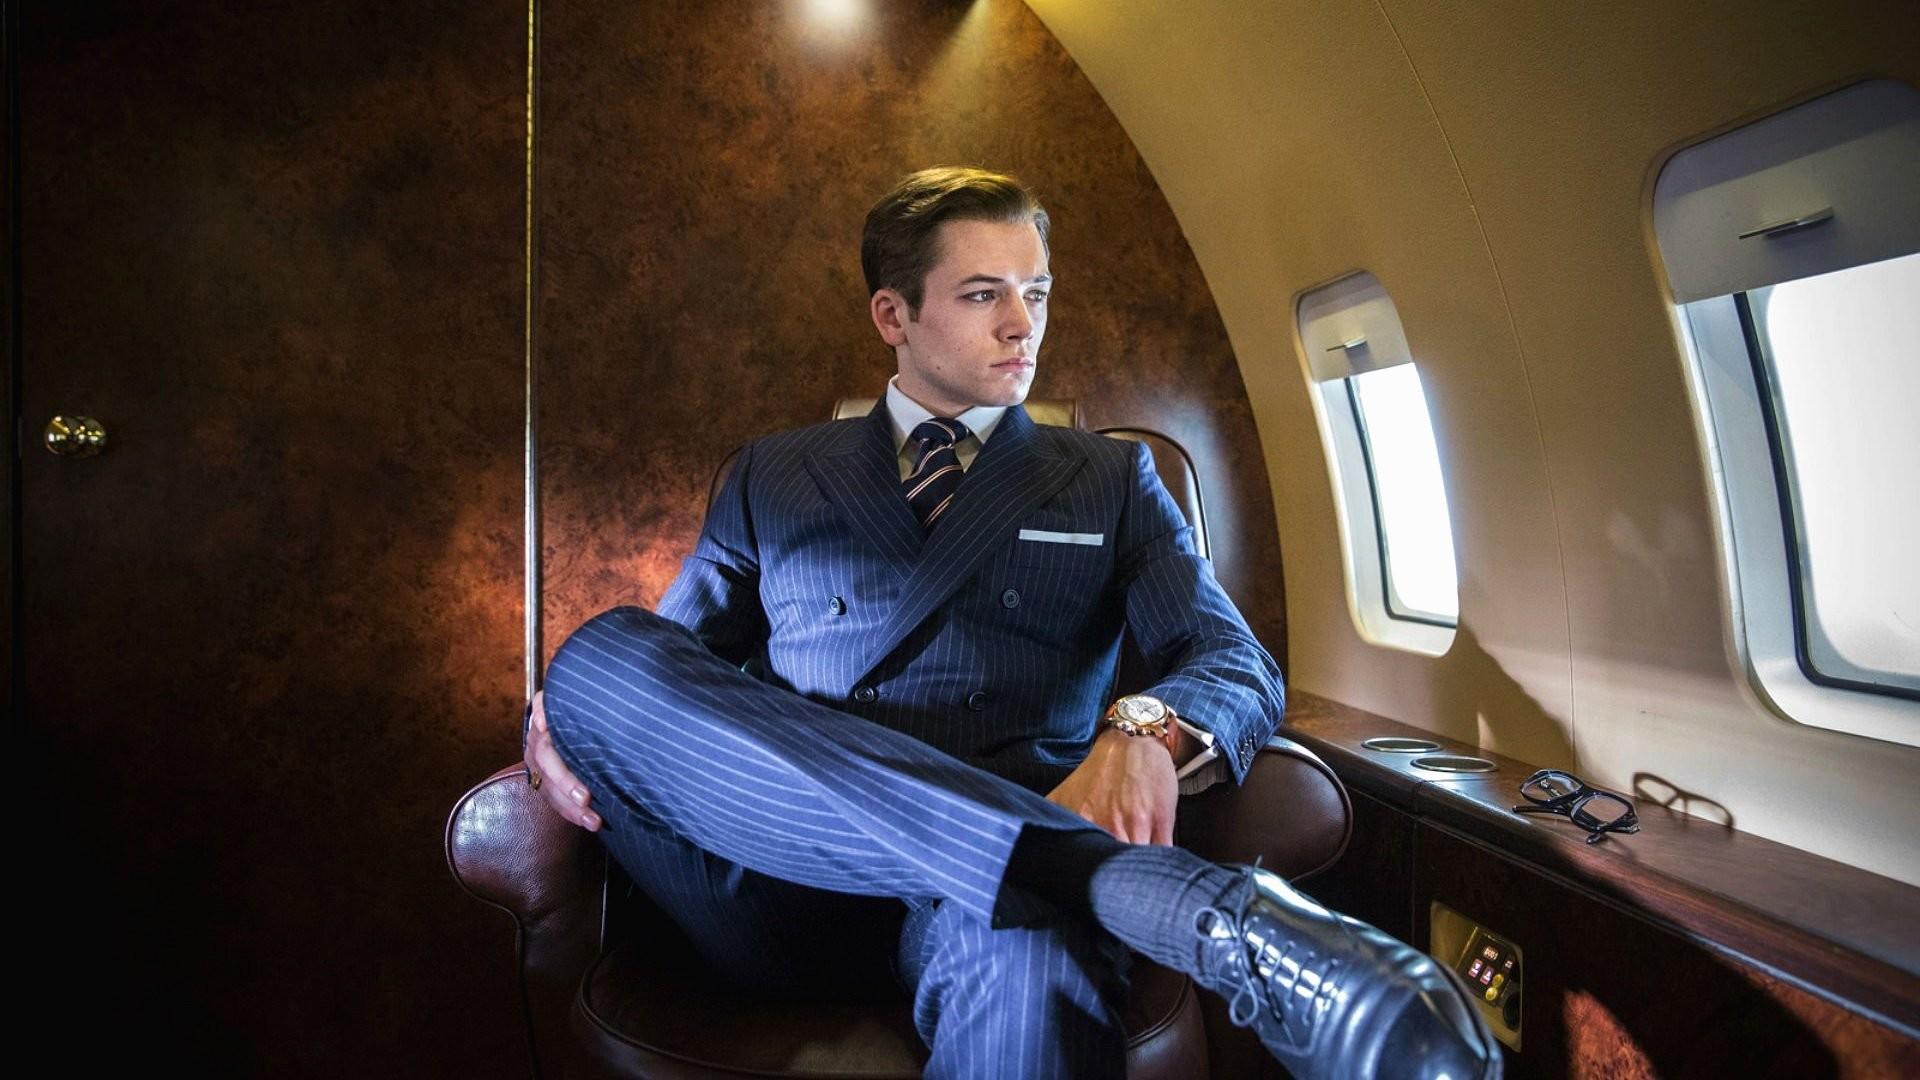 Res: 1920x1080, Movie - Kingsman: The Secret Service Taron Egerton Wallpaper